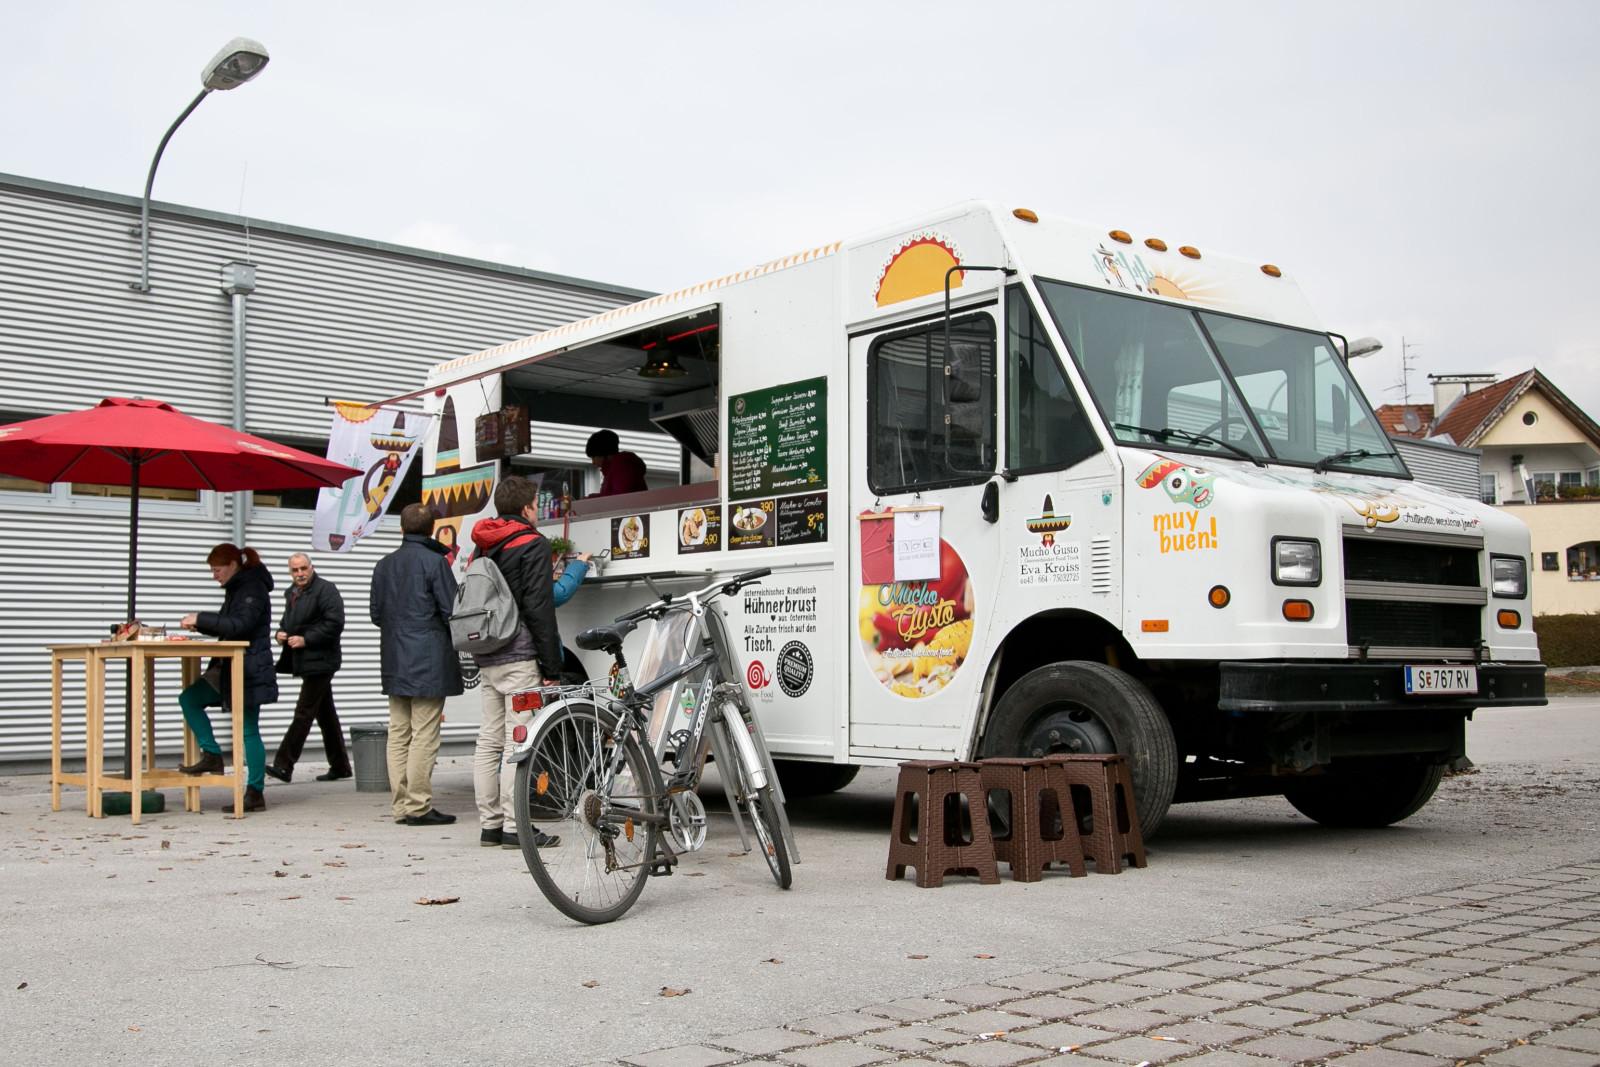 Food Truck Aglassingerstrasse